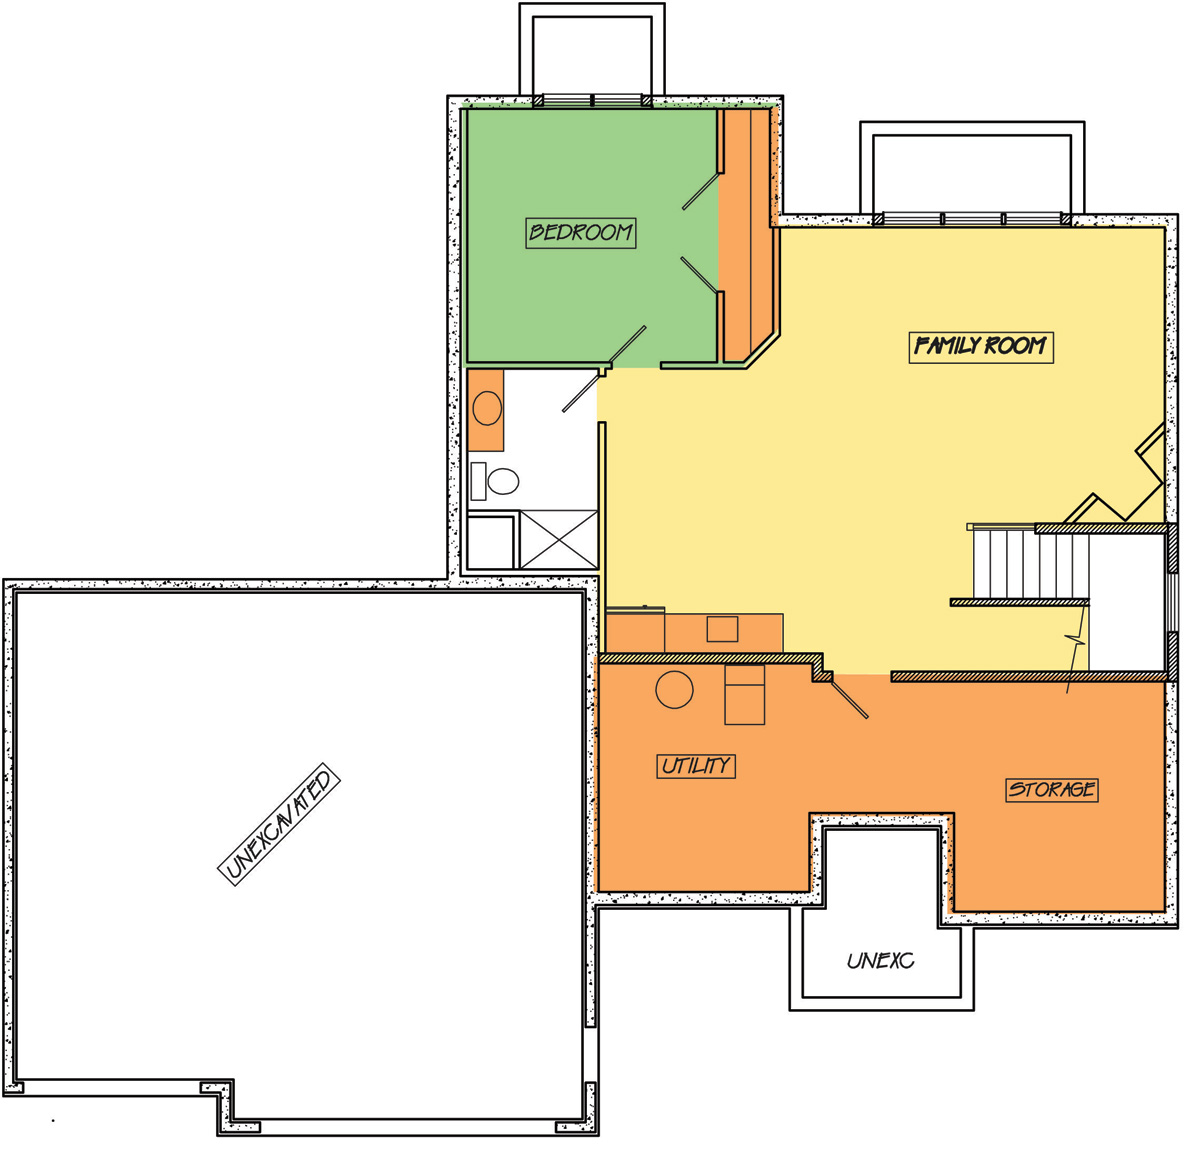 17266 69th Avenue N Maple Grove Mn Cedarcrest Sold Nih